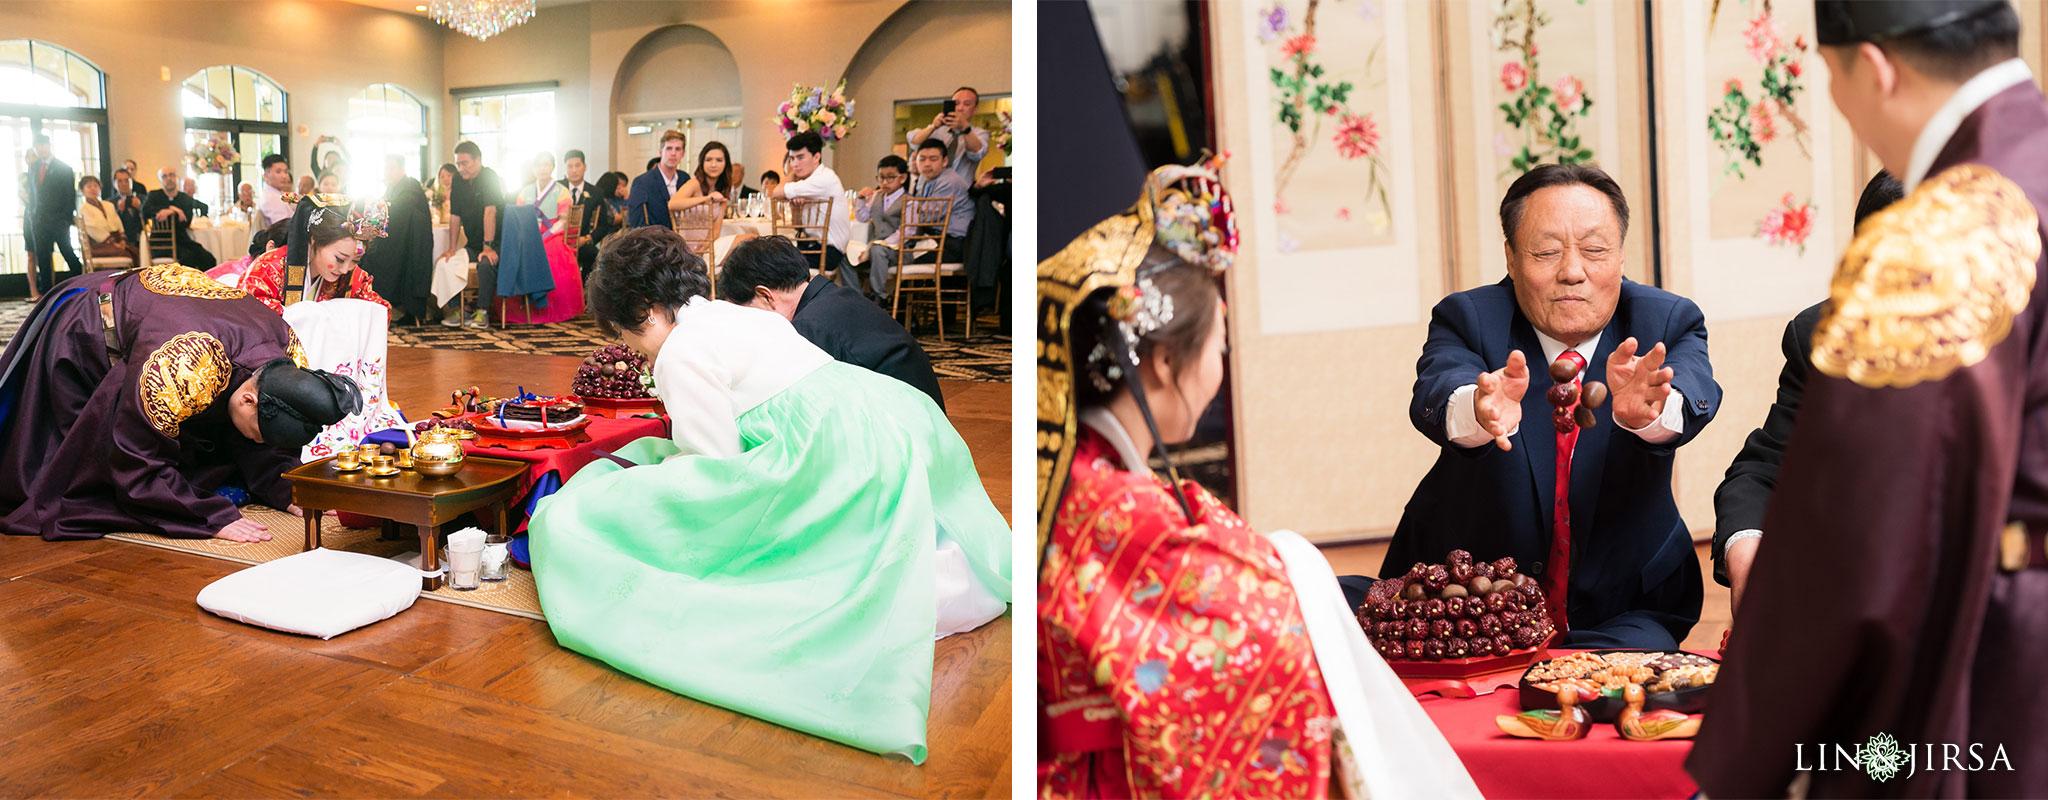 21 trump national golf club rancho palos verdes wedding tea ceremony photography